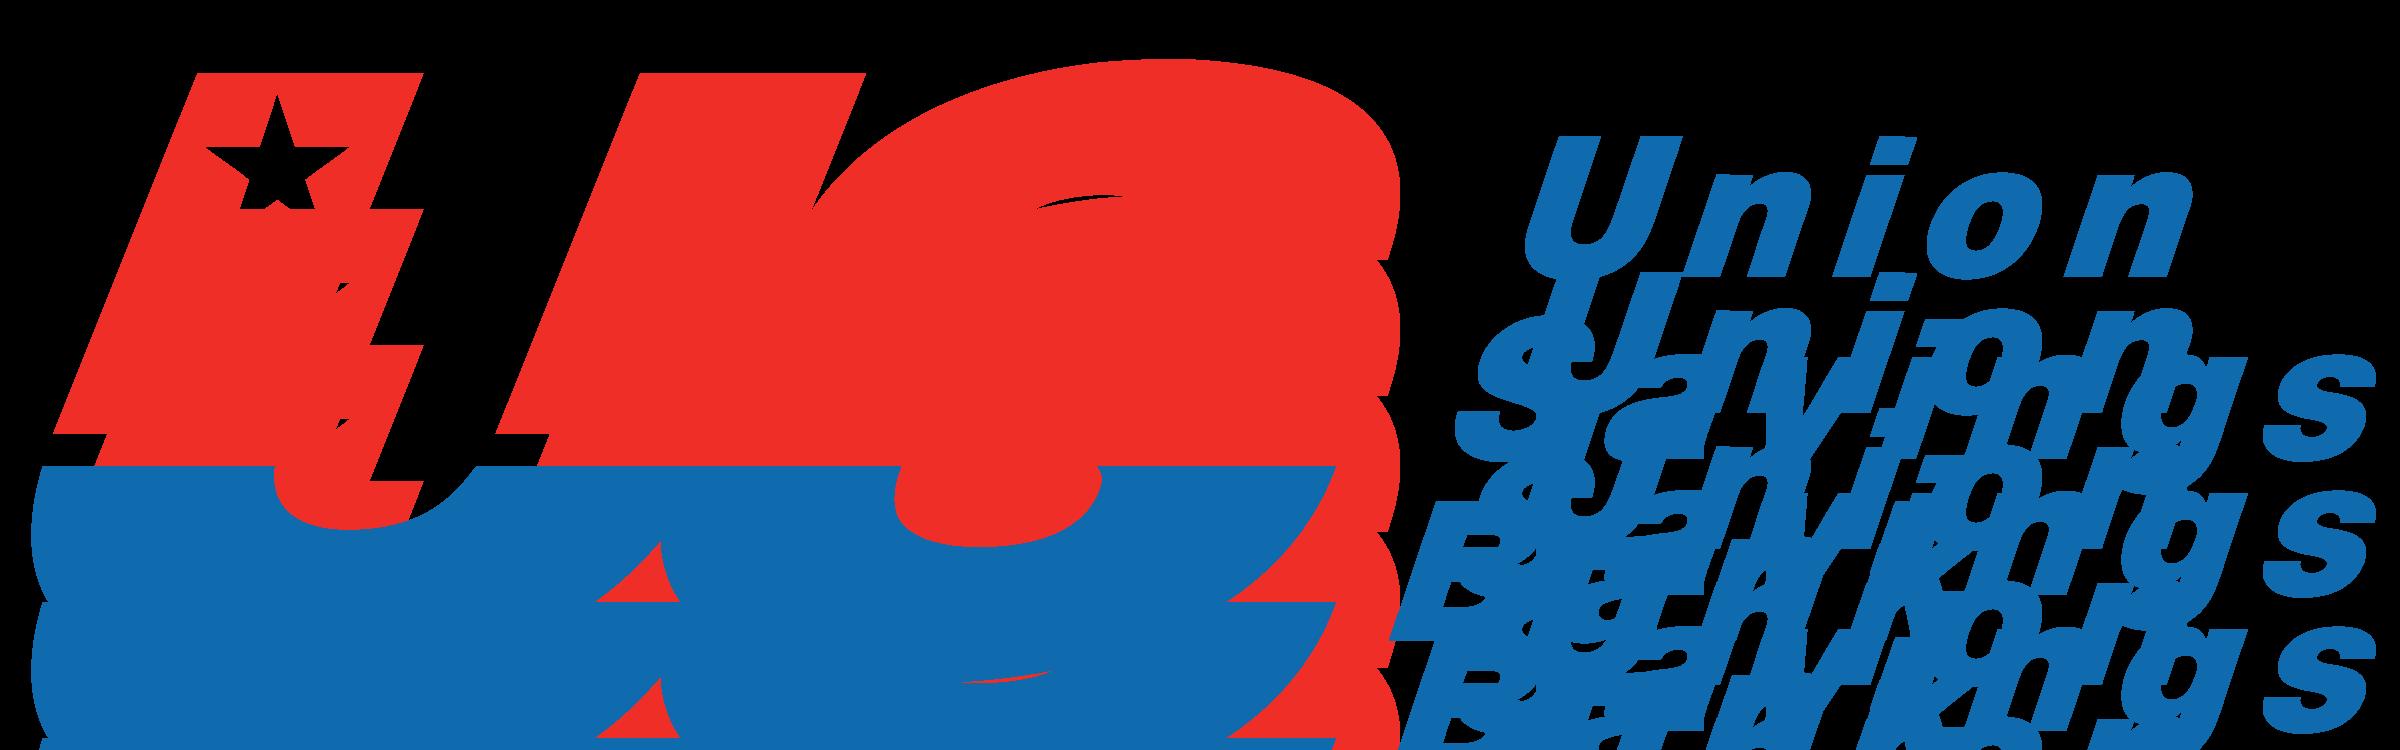 Usb logo inhp l. Neighborhood clipart housing area